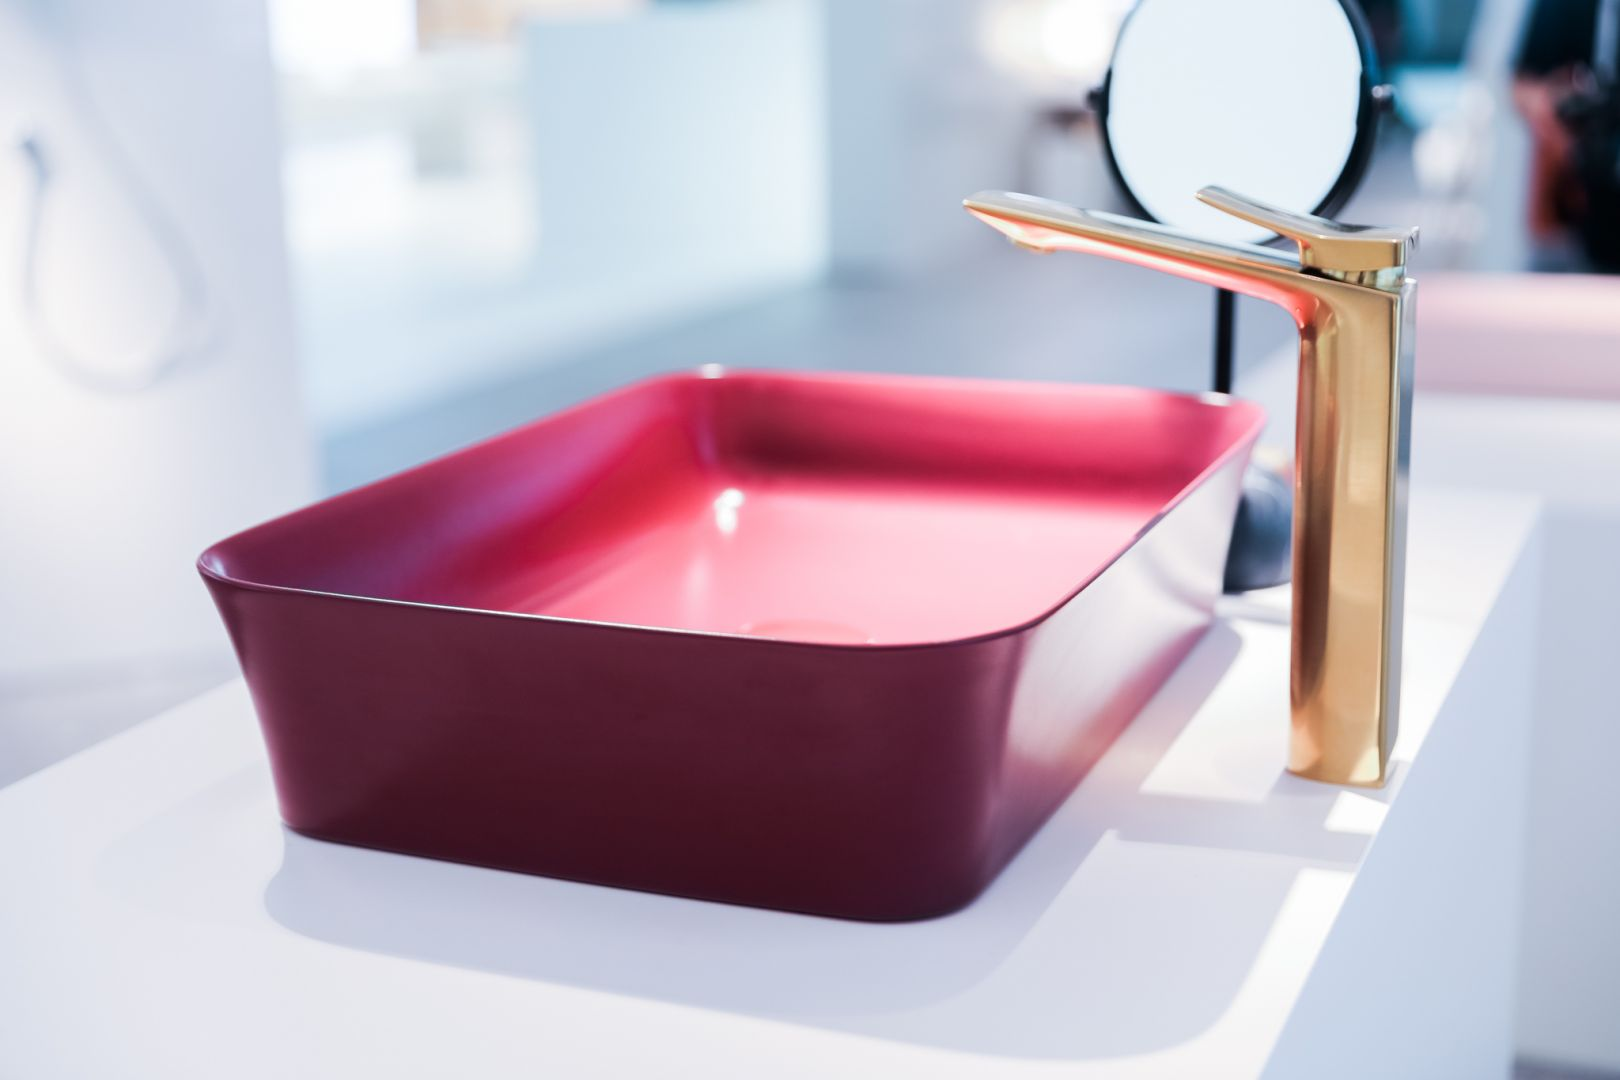 Kolorowa umywalka Ipalyss w kolorze pomegranate marki Ideal Standard. Fot. Ideal Standard